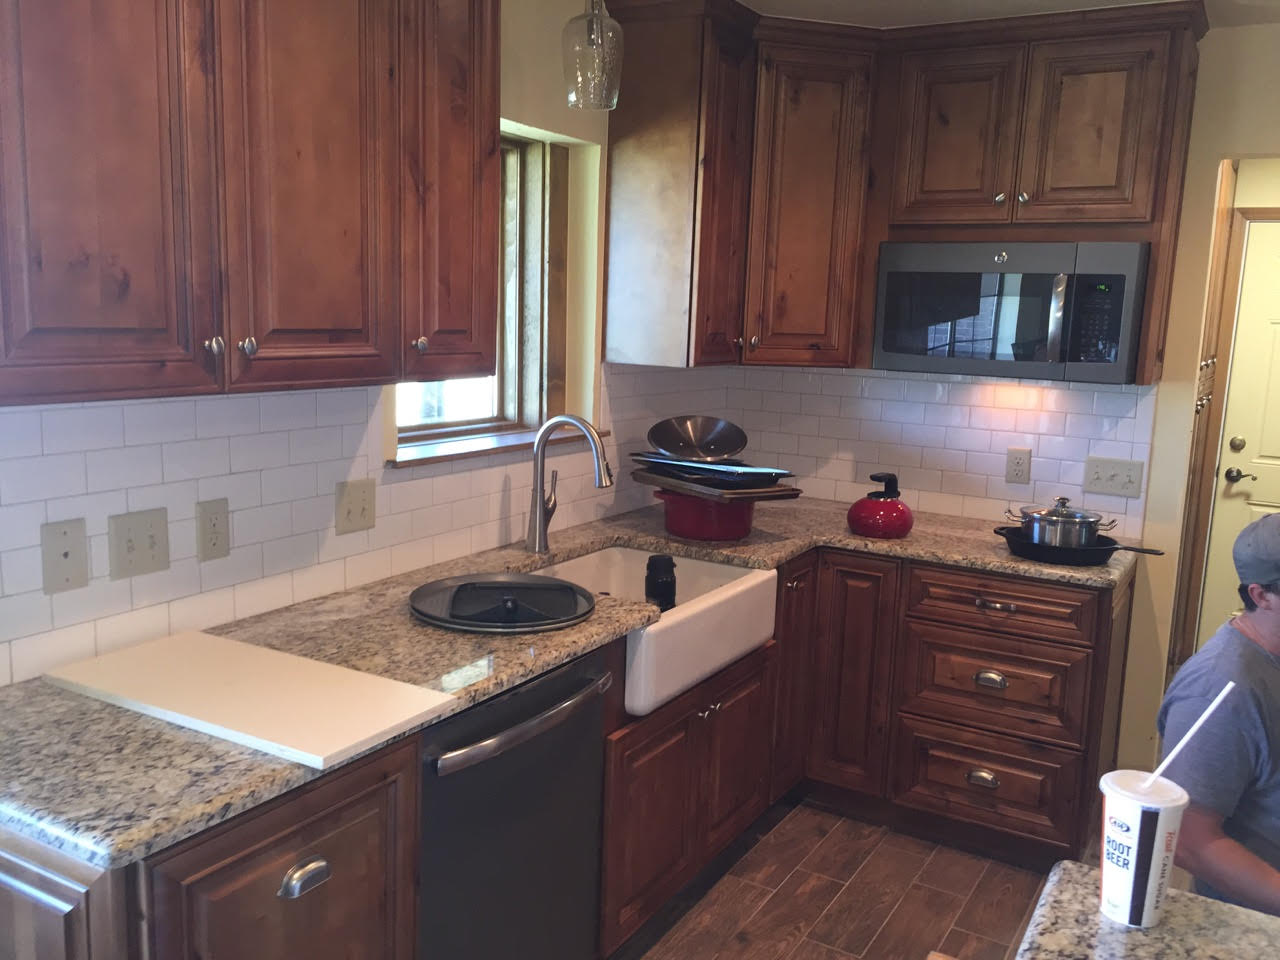 kitchen cabinets phoenix cabintes knm raised panel door | premium